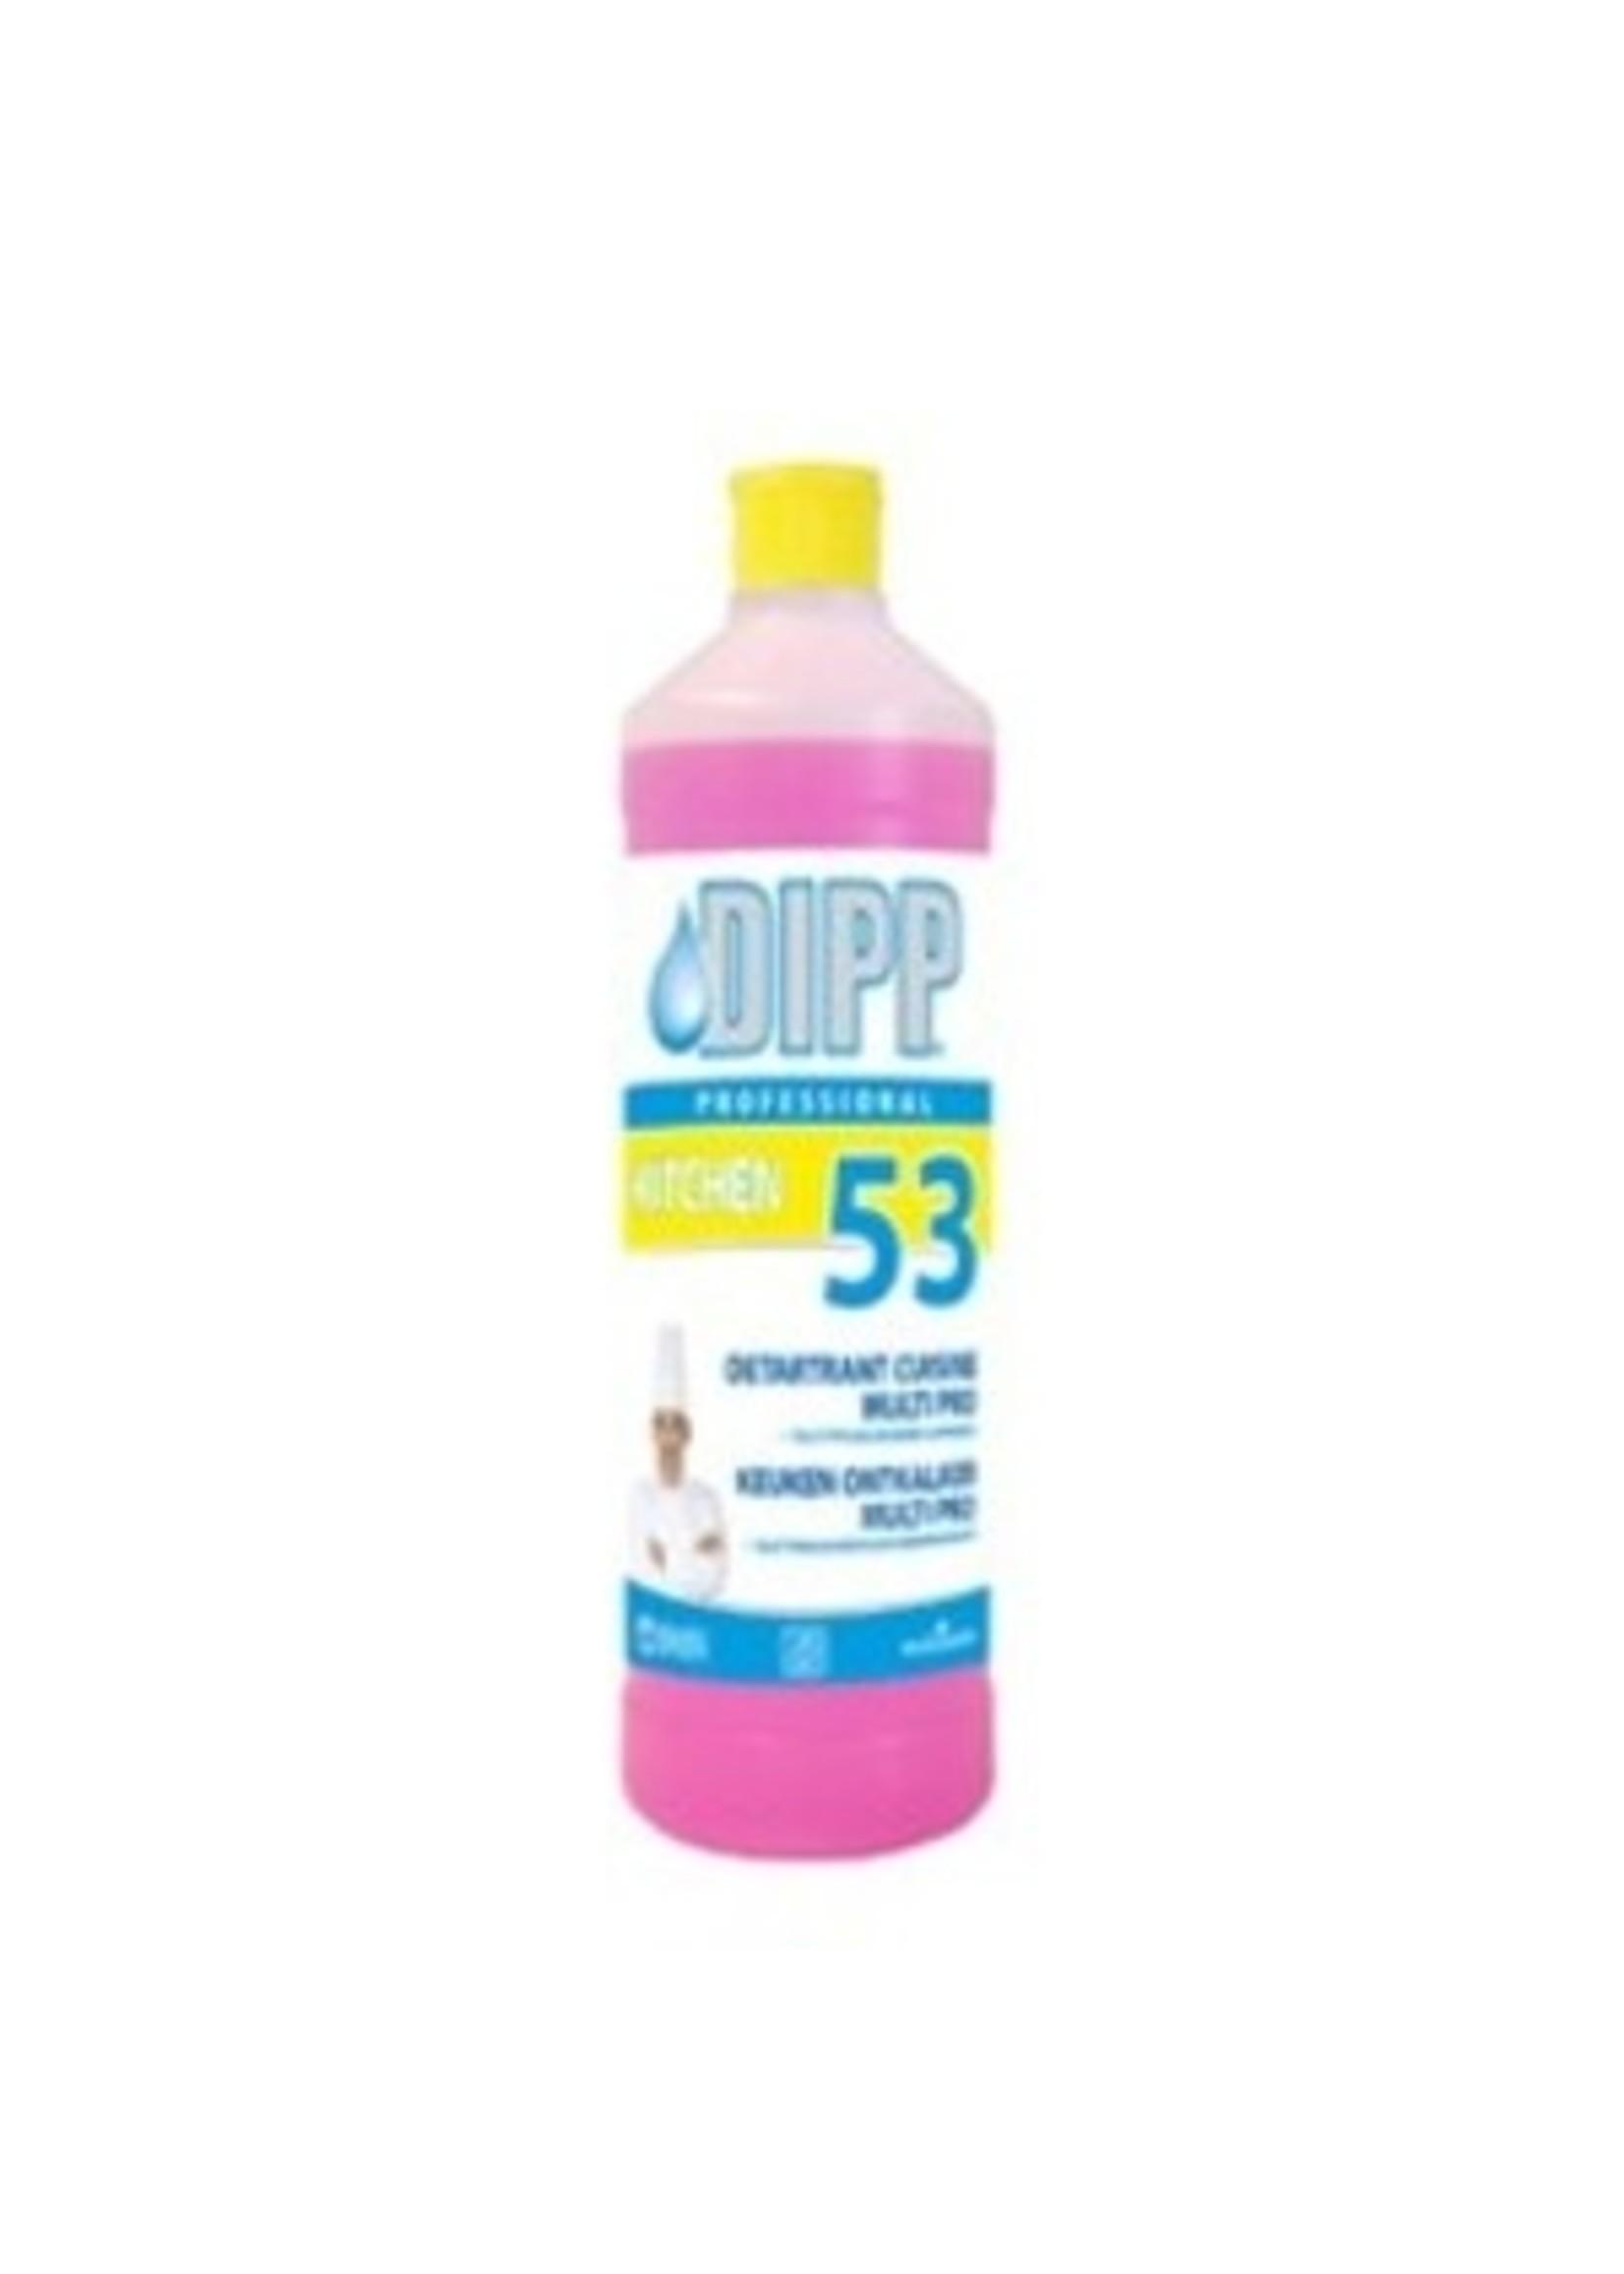 DIPP DIPP N°53 - KEUKEN ONTKALKER MULTI PRO 1L